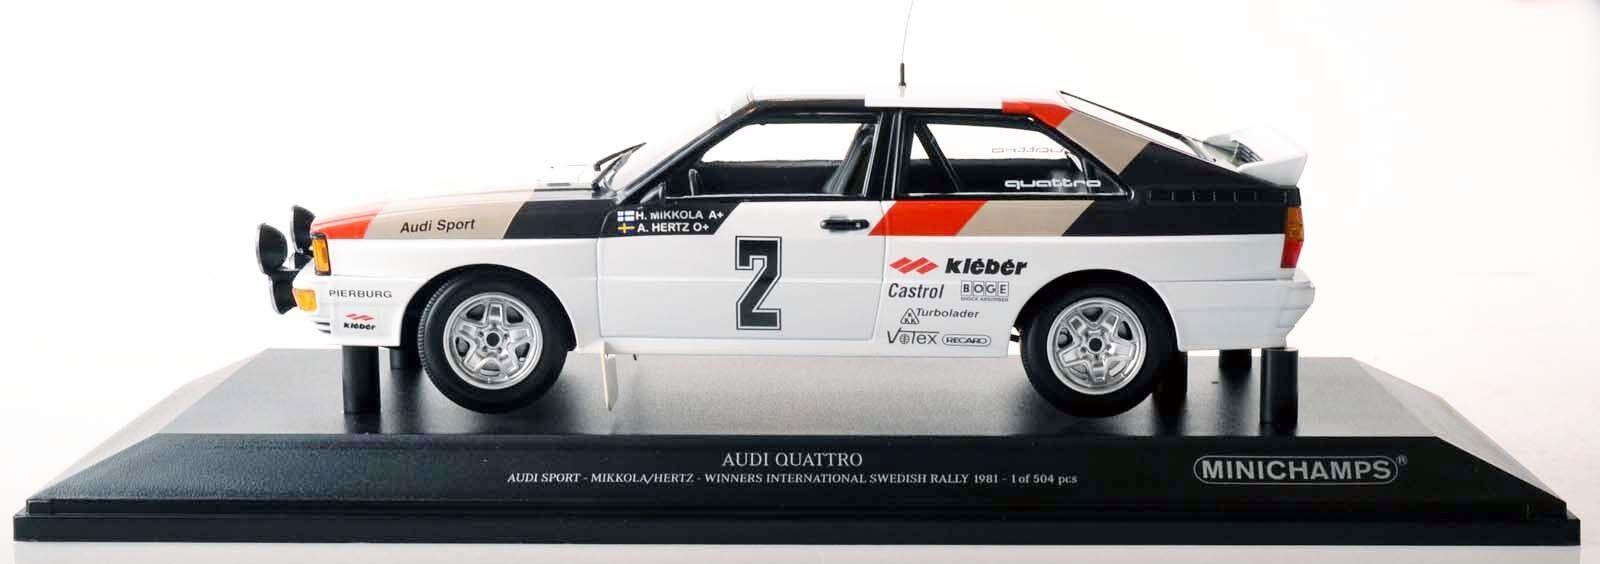 Minichamps 155811102 Audi Quattro Mikkola Hertz Swedish rally 1981 1 18 nuevo en el embalaje original